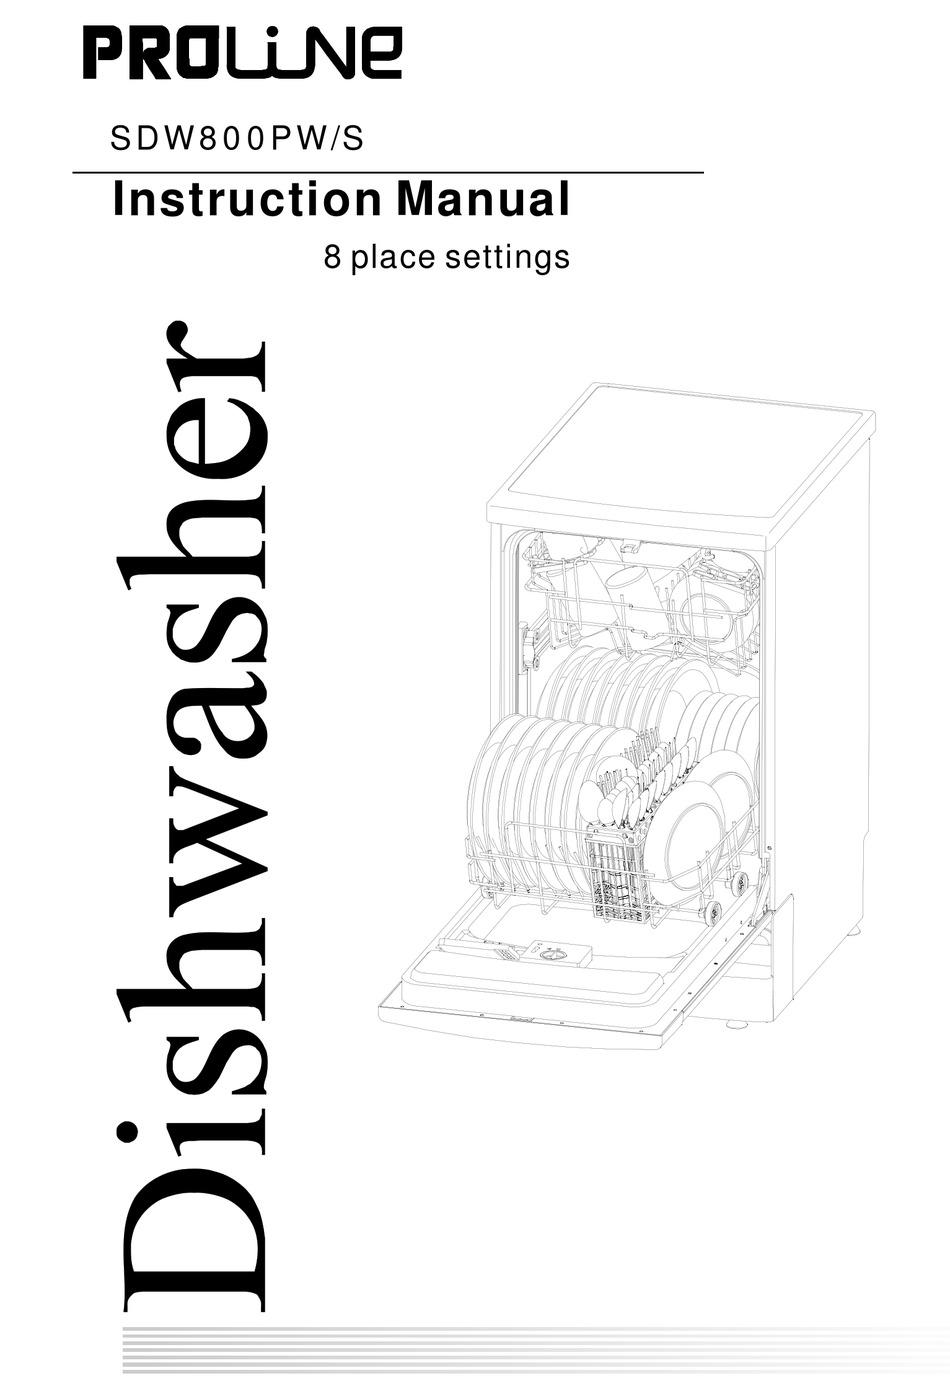 Proline Sdw800pw S Instruction Manual Pdf Download Manualslib